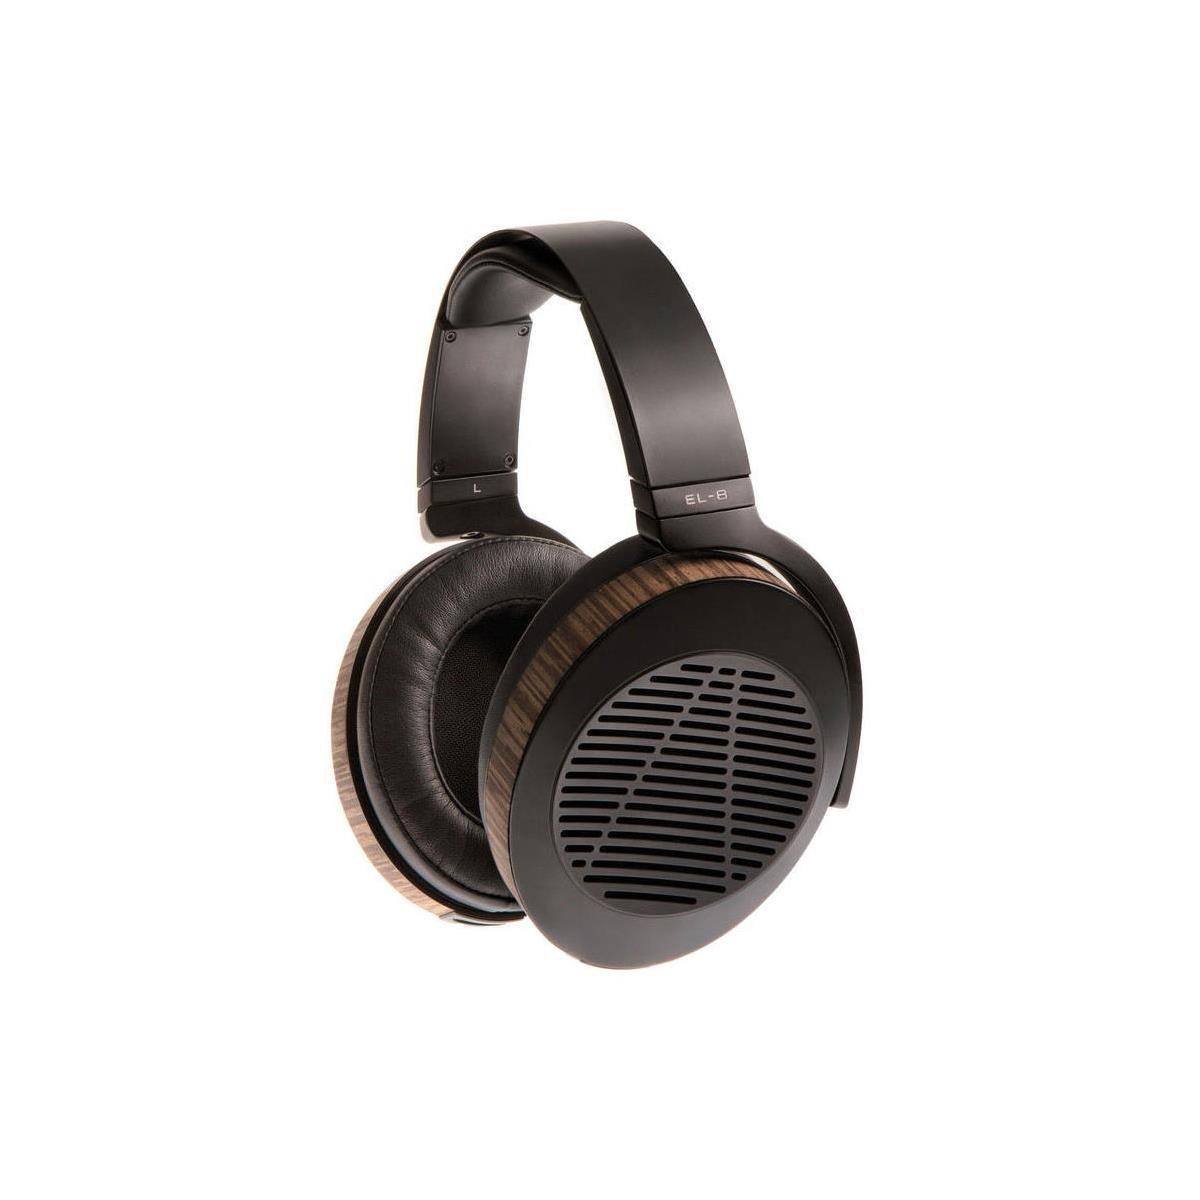 Audeze EL-8 Open Back Planar Magnetic Headphones (Refurbished): $400 + free shipping